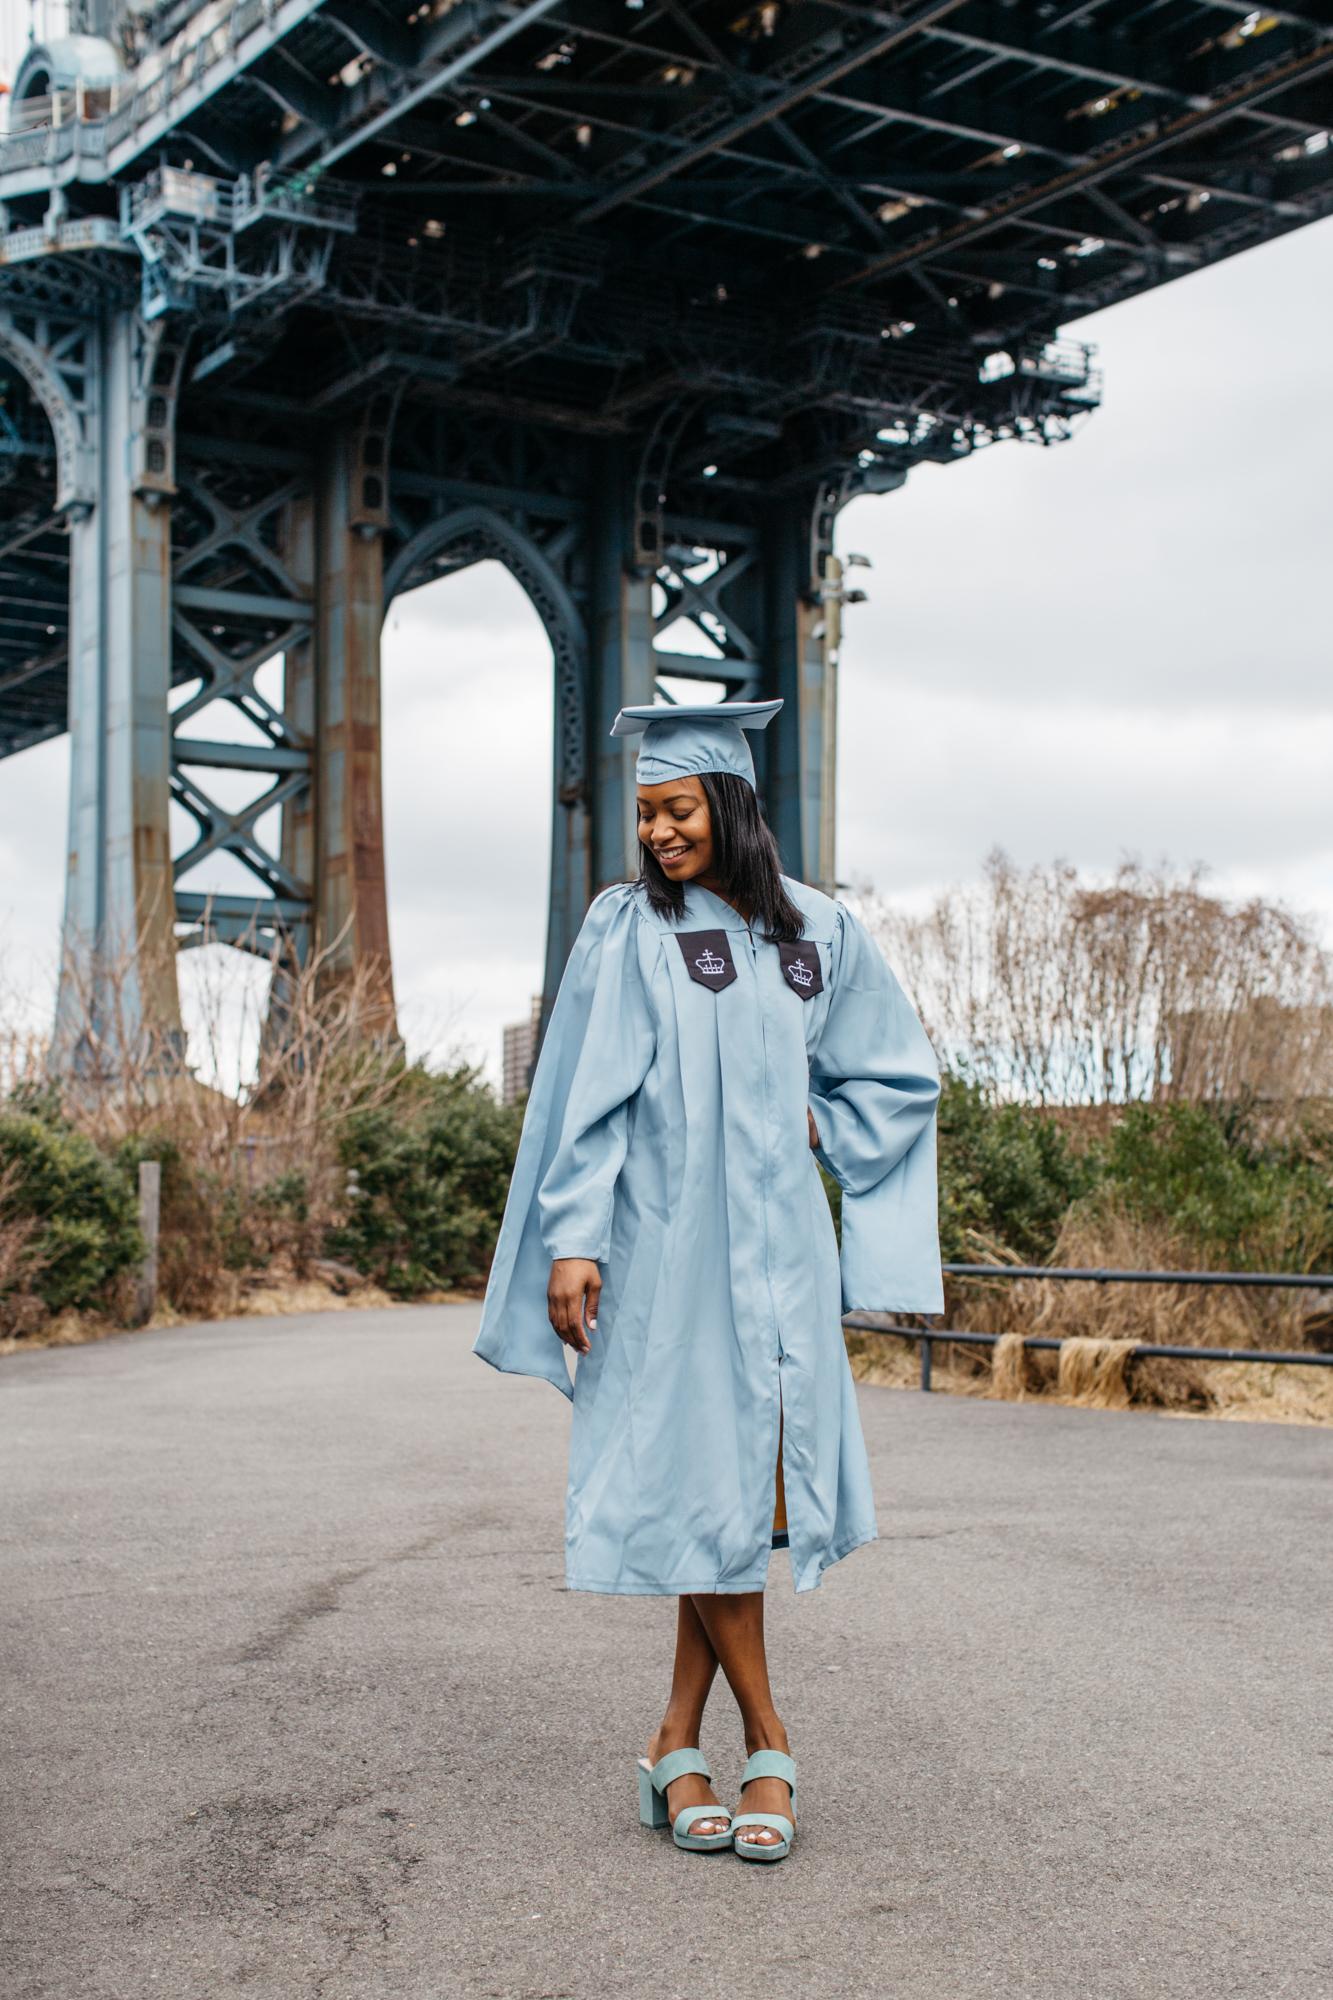 Courtney_Graduation_Photographer_Colombia_MBA_Student_DUMBO_portrait_NYC_Brooklyn-21.jpg